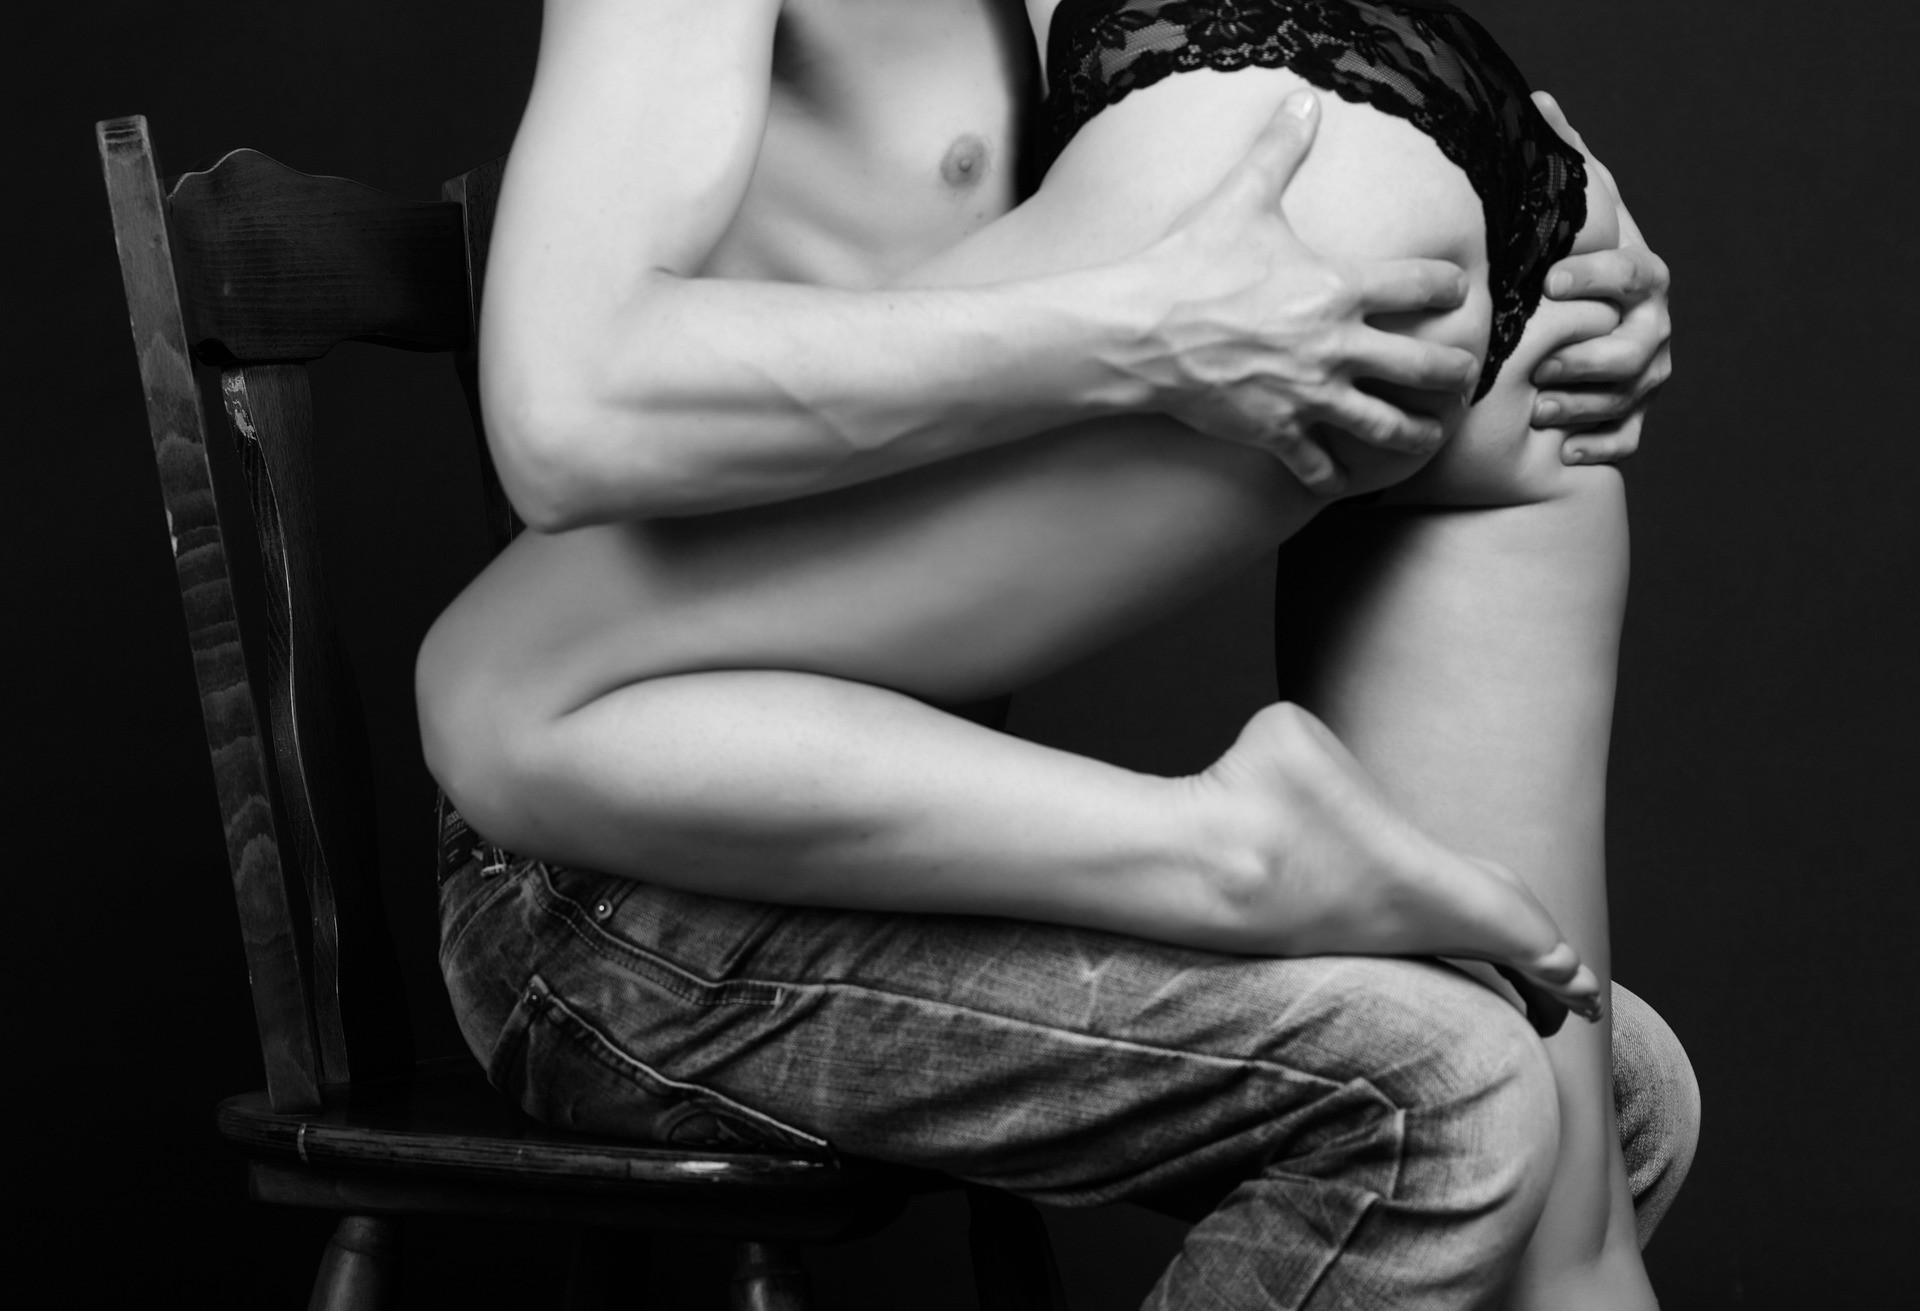 Ukrainian women' sexual attitudes